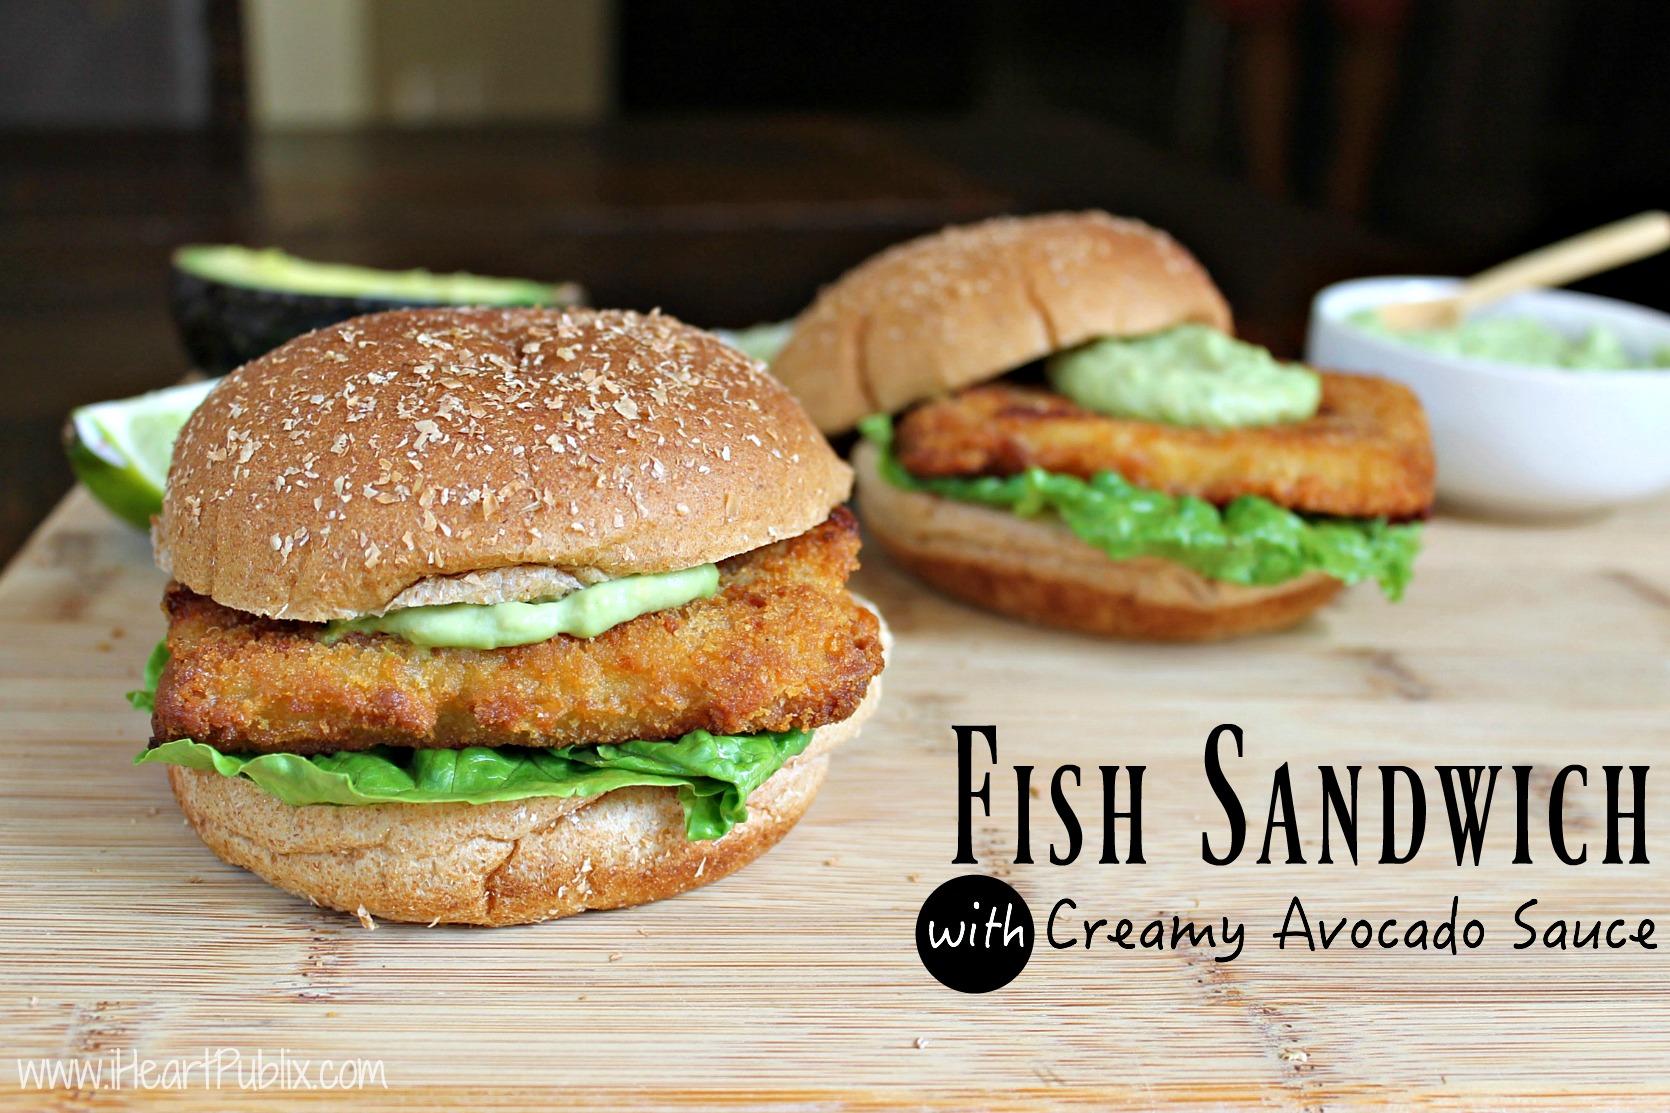 fish-sandwich-with-creamy-avocado-sauce